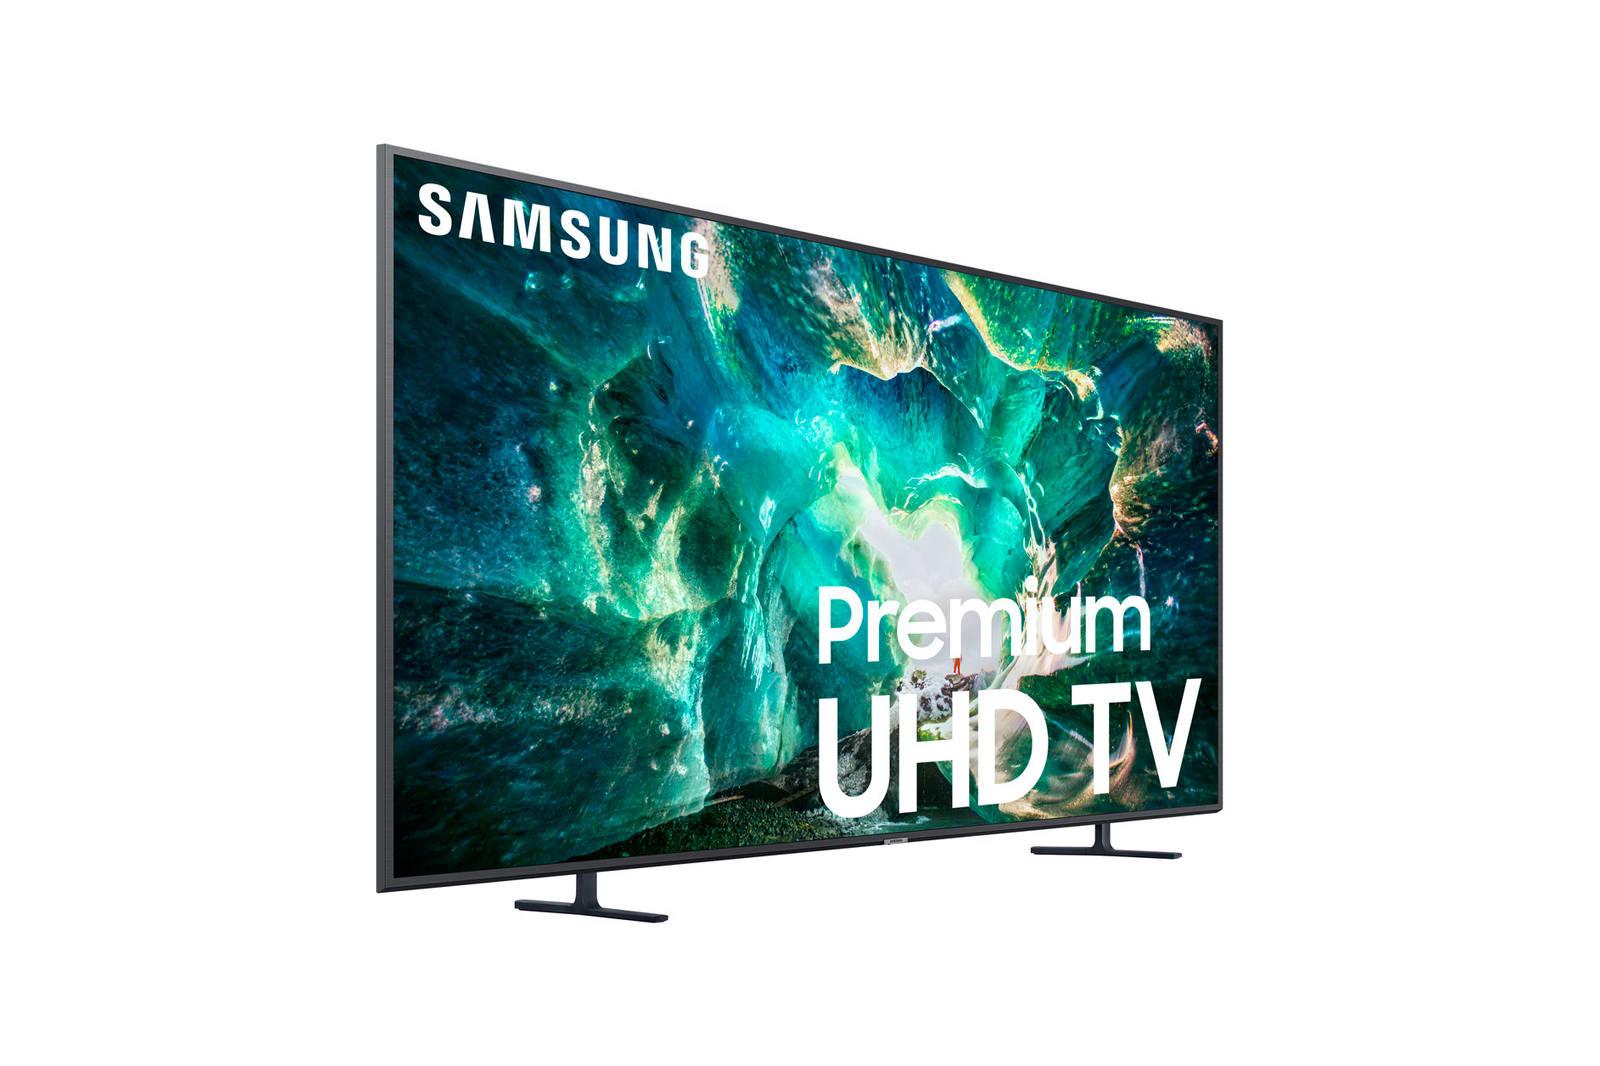 Samsung RU8000 4K TV (82-Inch)